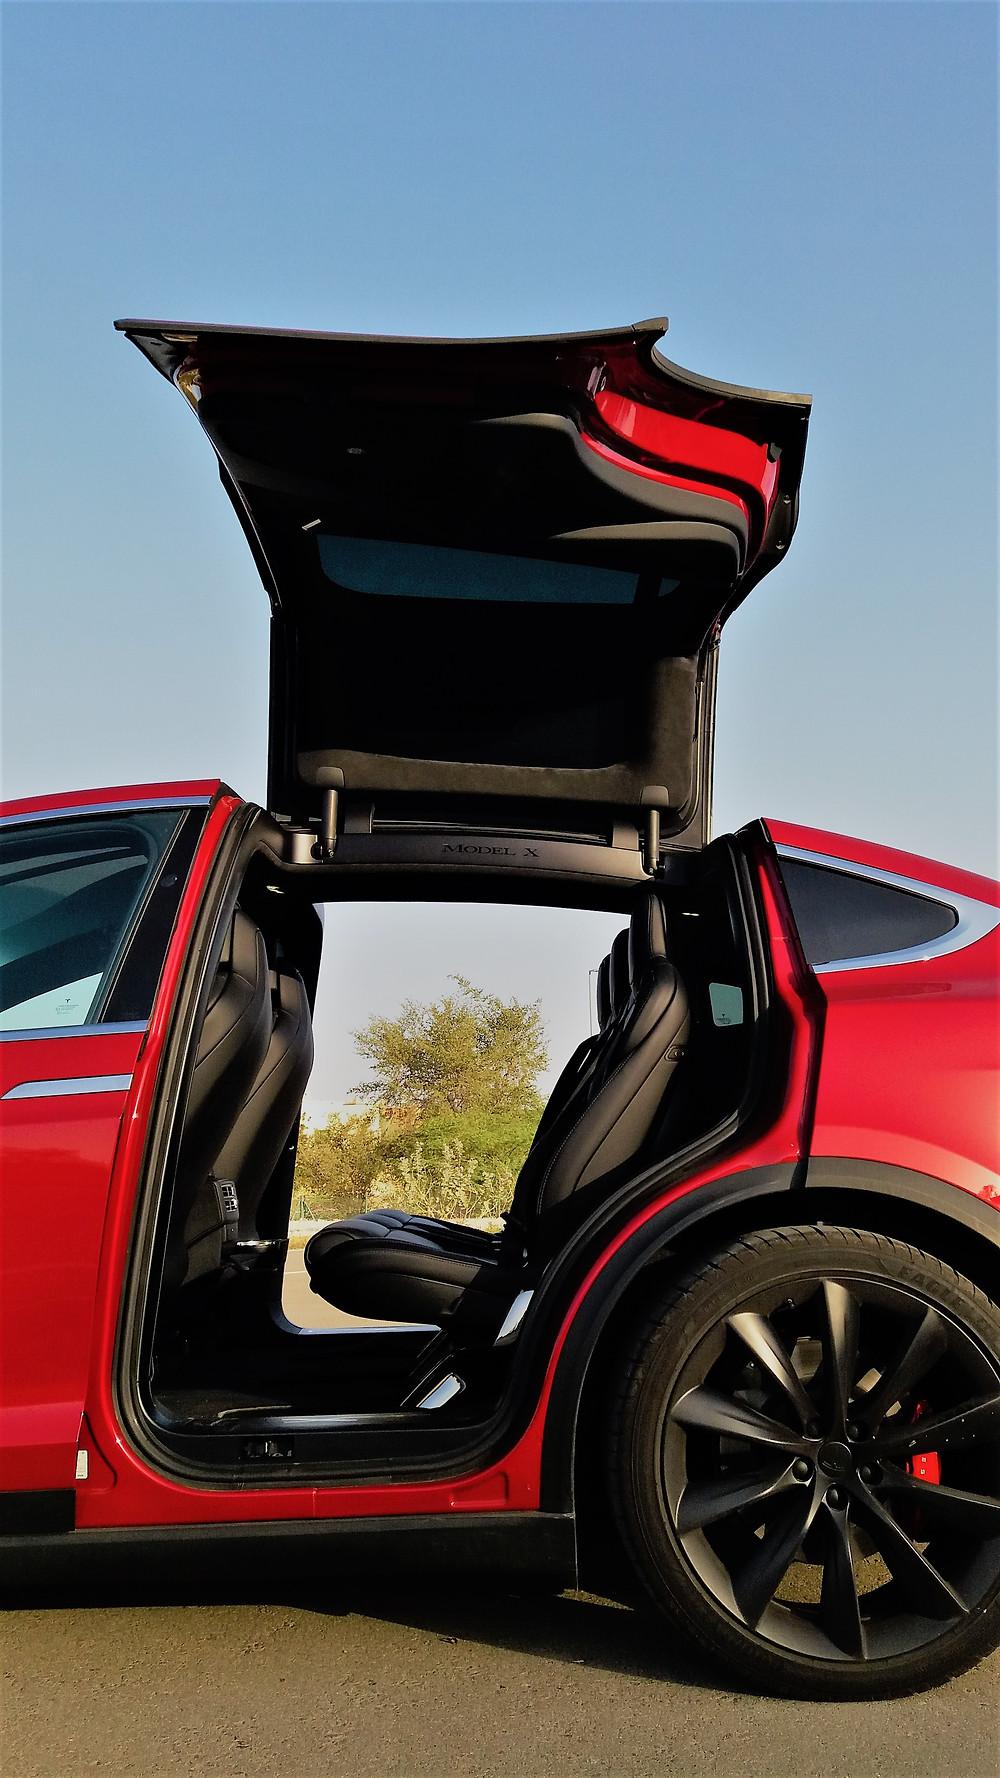 Tesla Model X Gull Wing doors